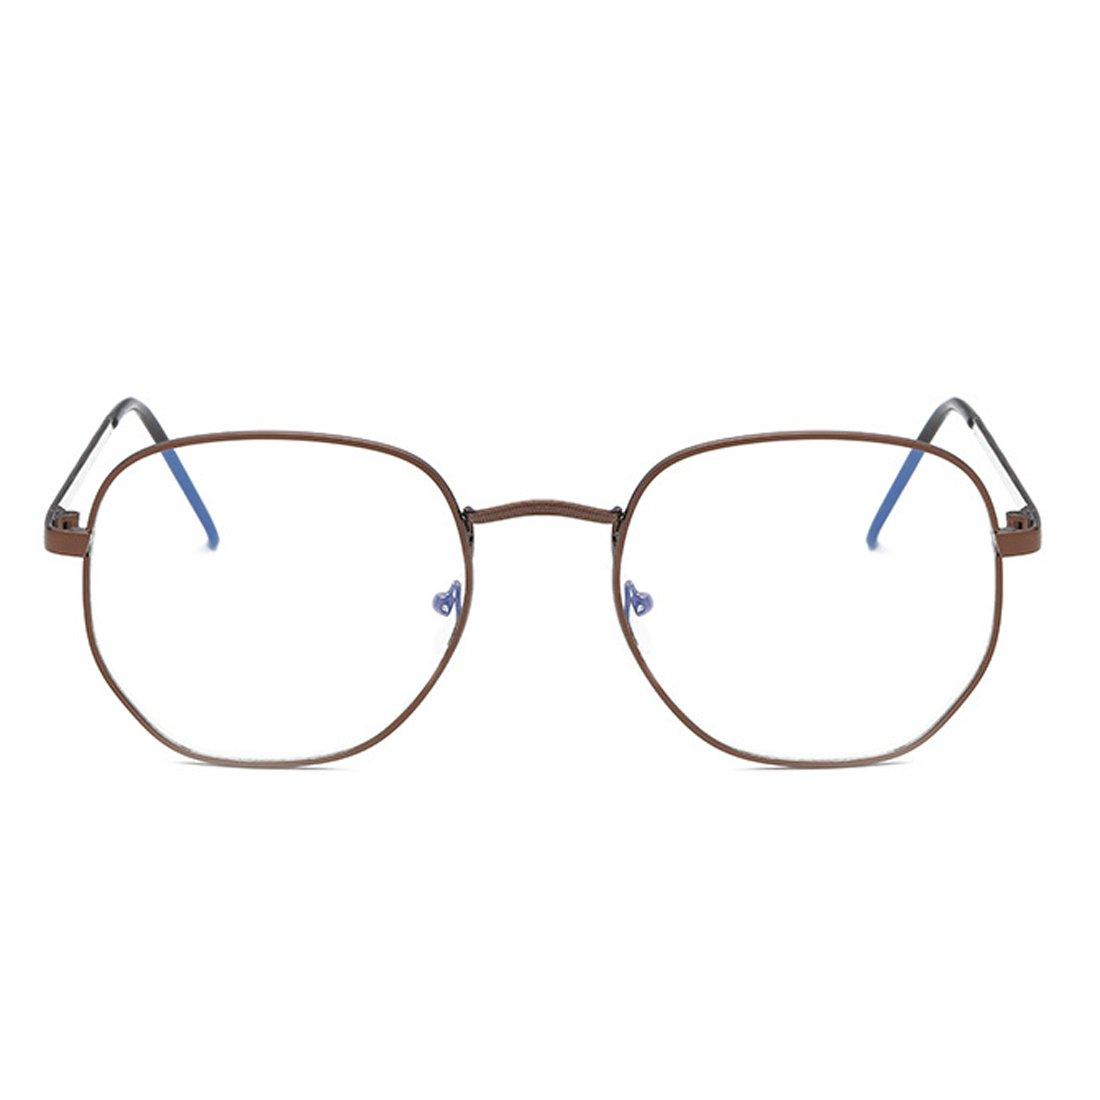 Aiweijia Fashion Myopie Brille Facelifting Brille Metall ...